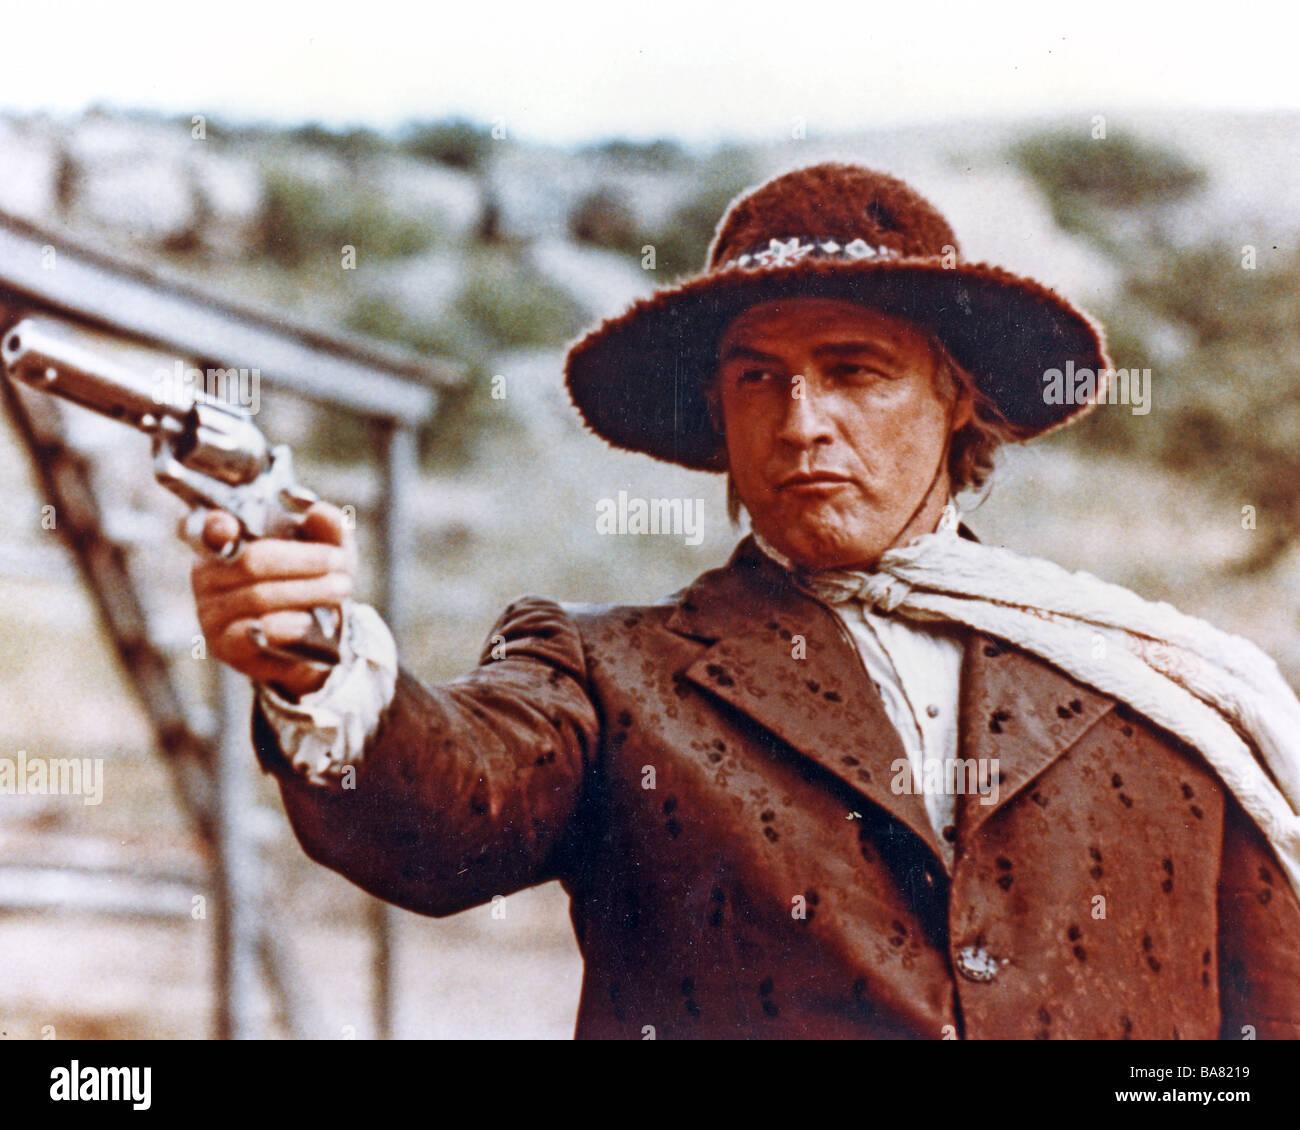 THE MISSOURI BREAKS  1976 UA film with Marlon Brando - Stock Image